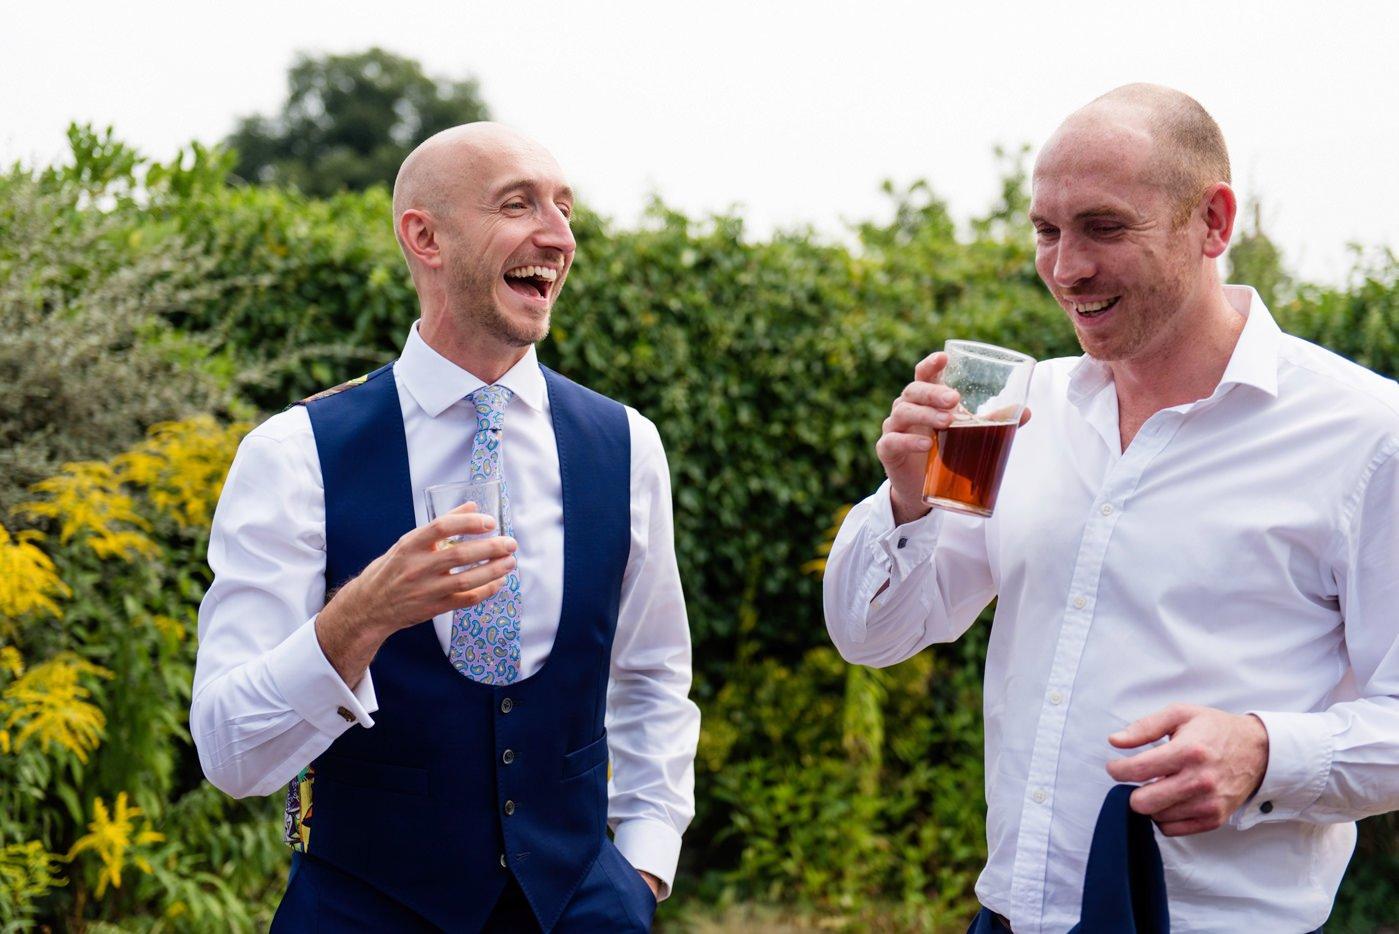 bignor-park-wedding-photography-robyn-and-tom-19